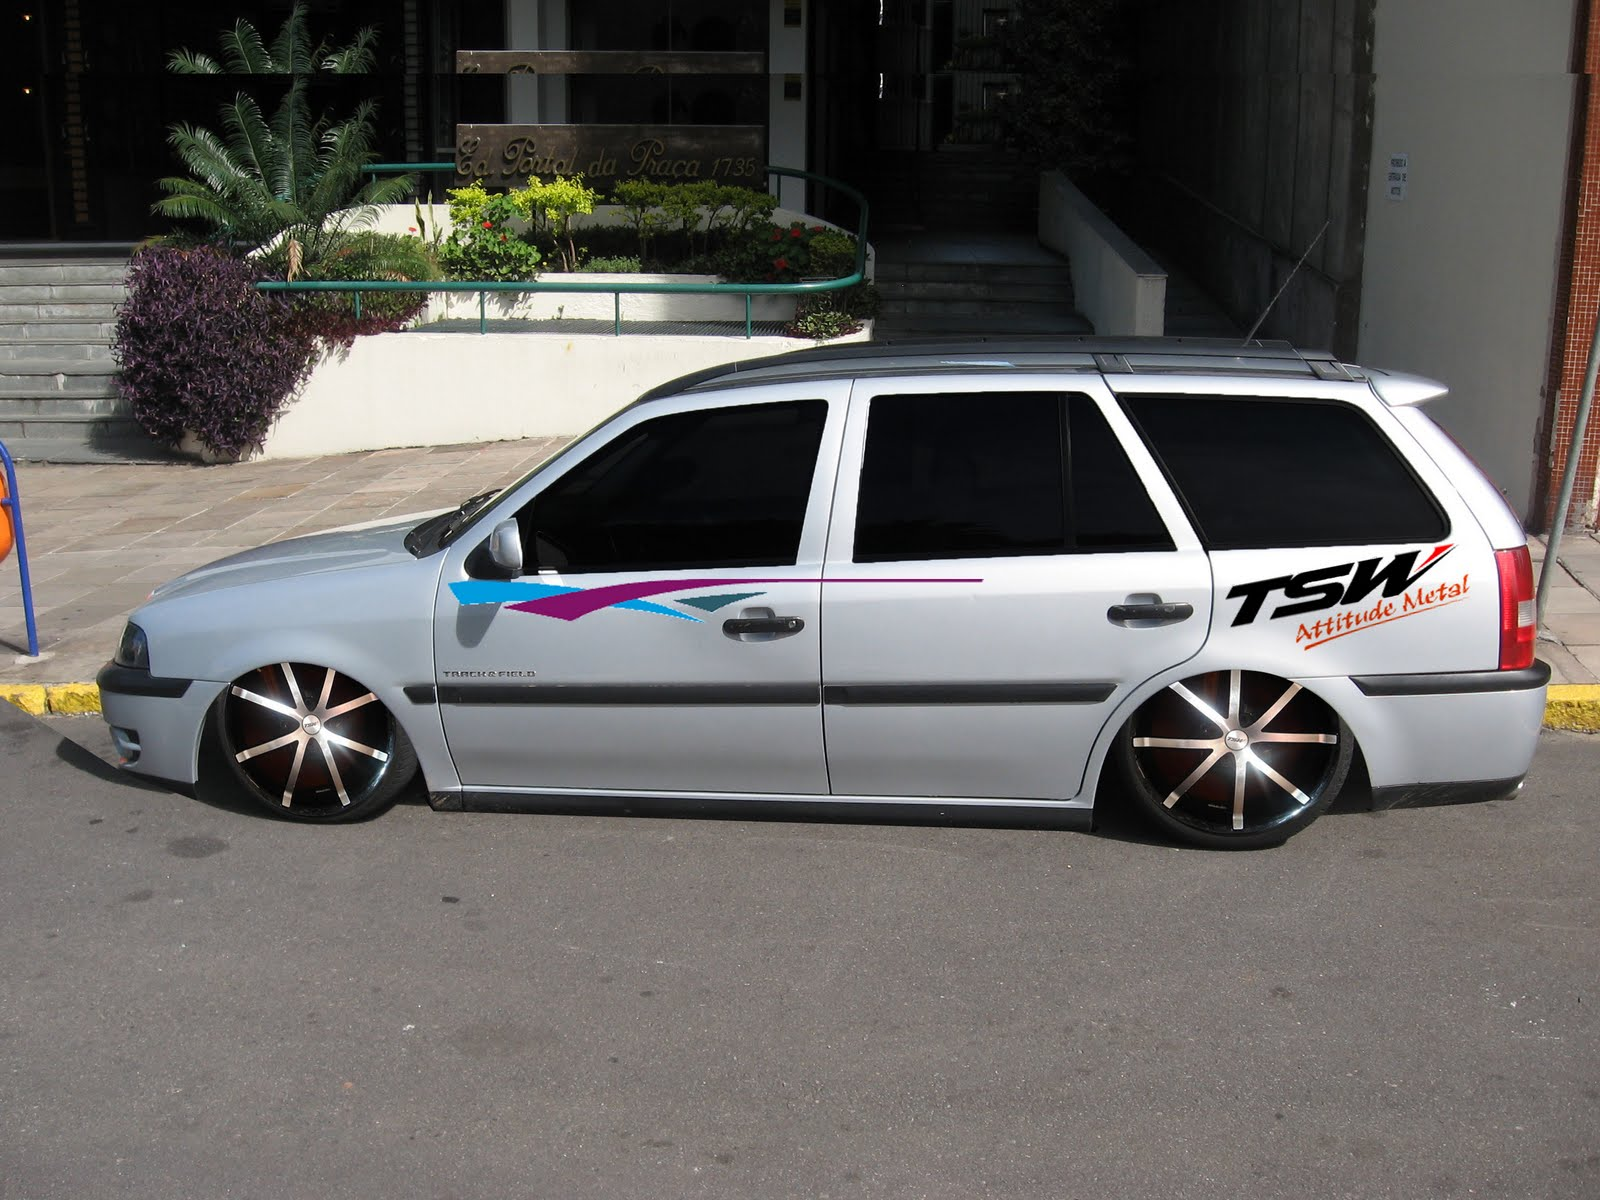 2010 Subaru Impreza Wrx >> Best Tuning Virtual: Parati G3